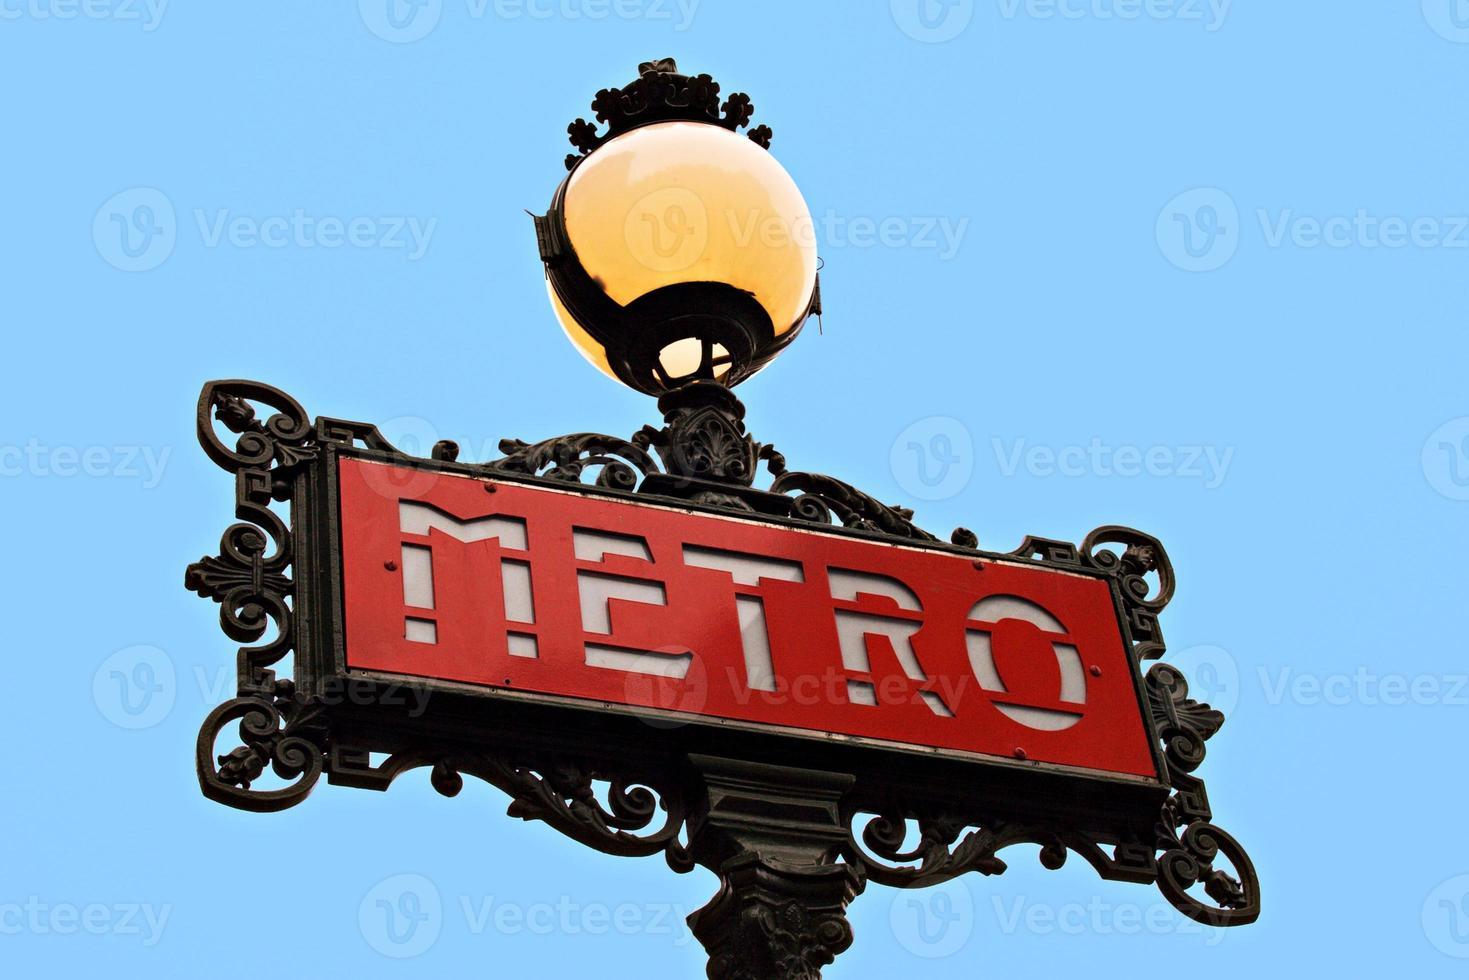 Parijse metro teken foto